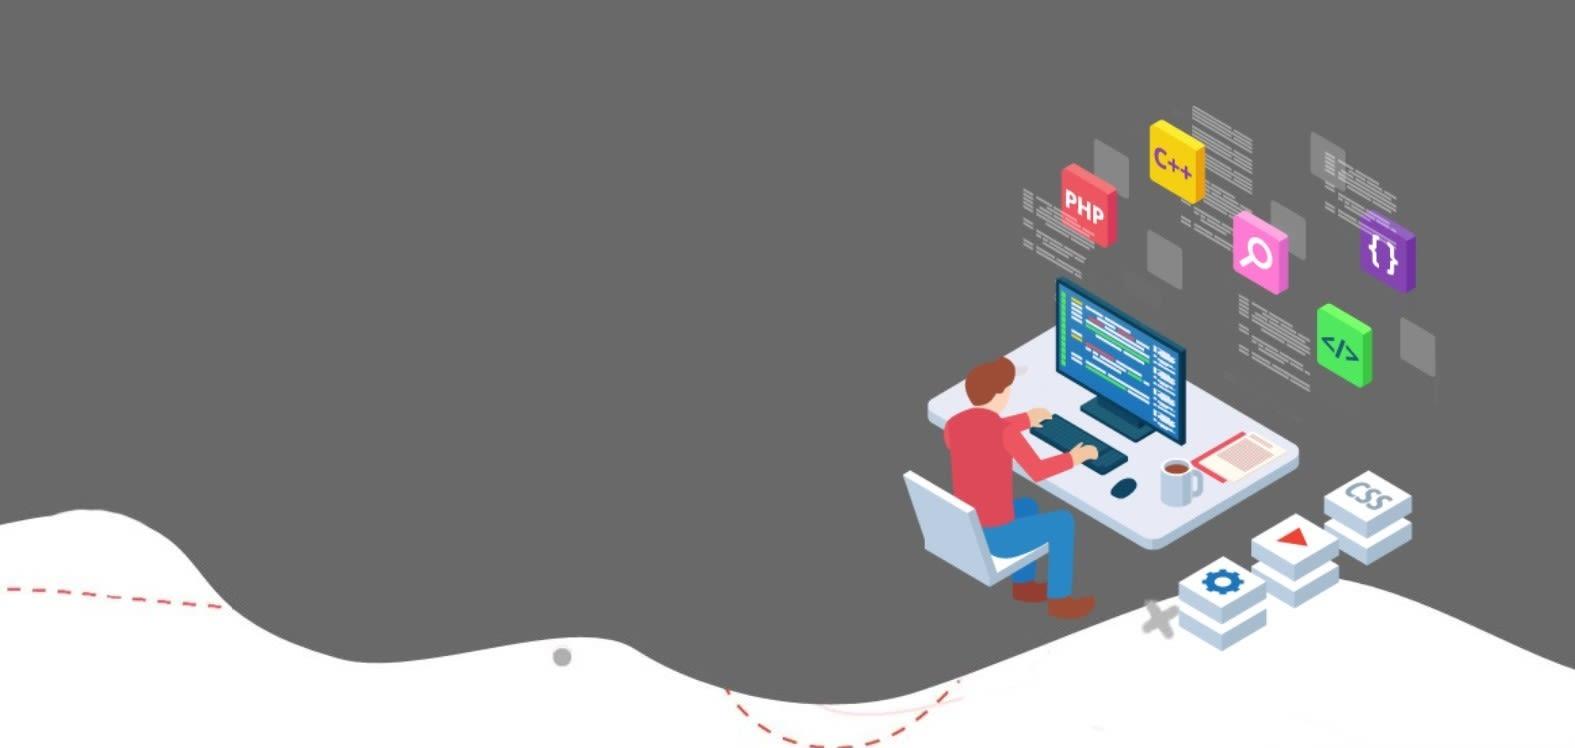 Web design and development by iEngageIT - Belfast